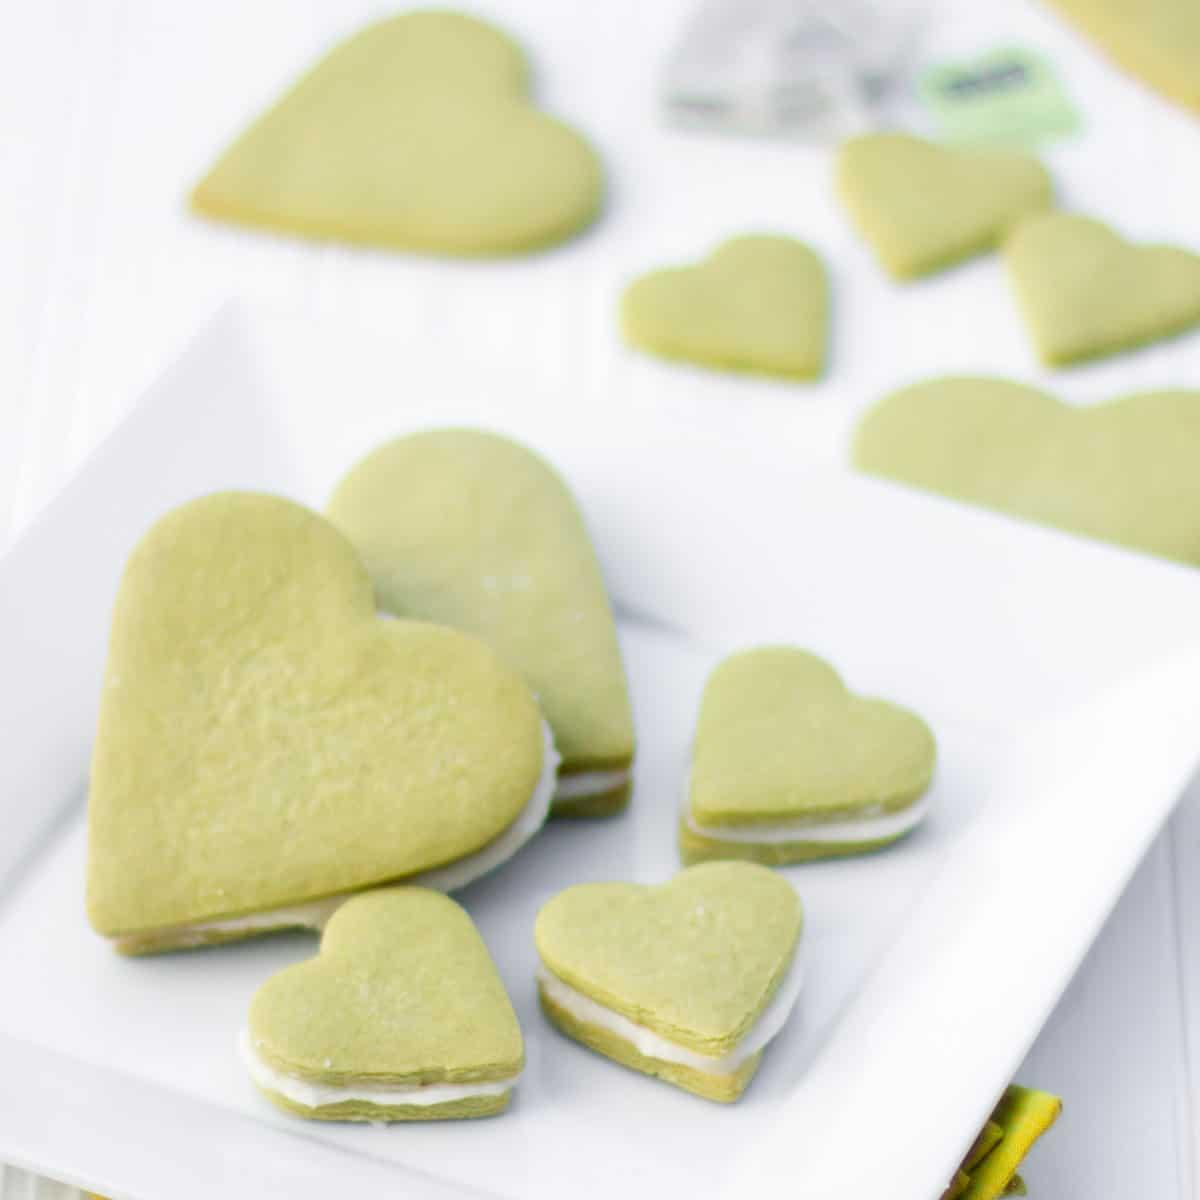 A plate of heart shaped sandwich sugar cookies